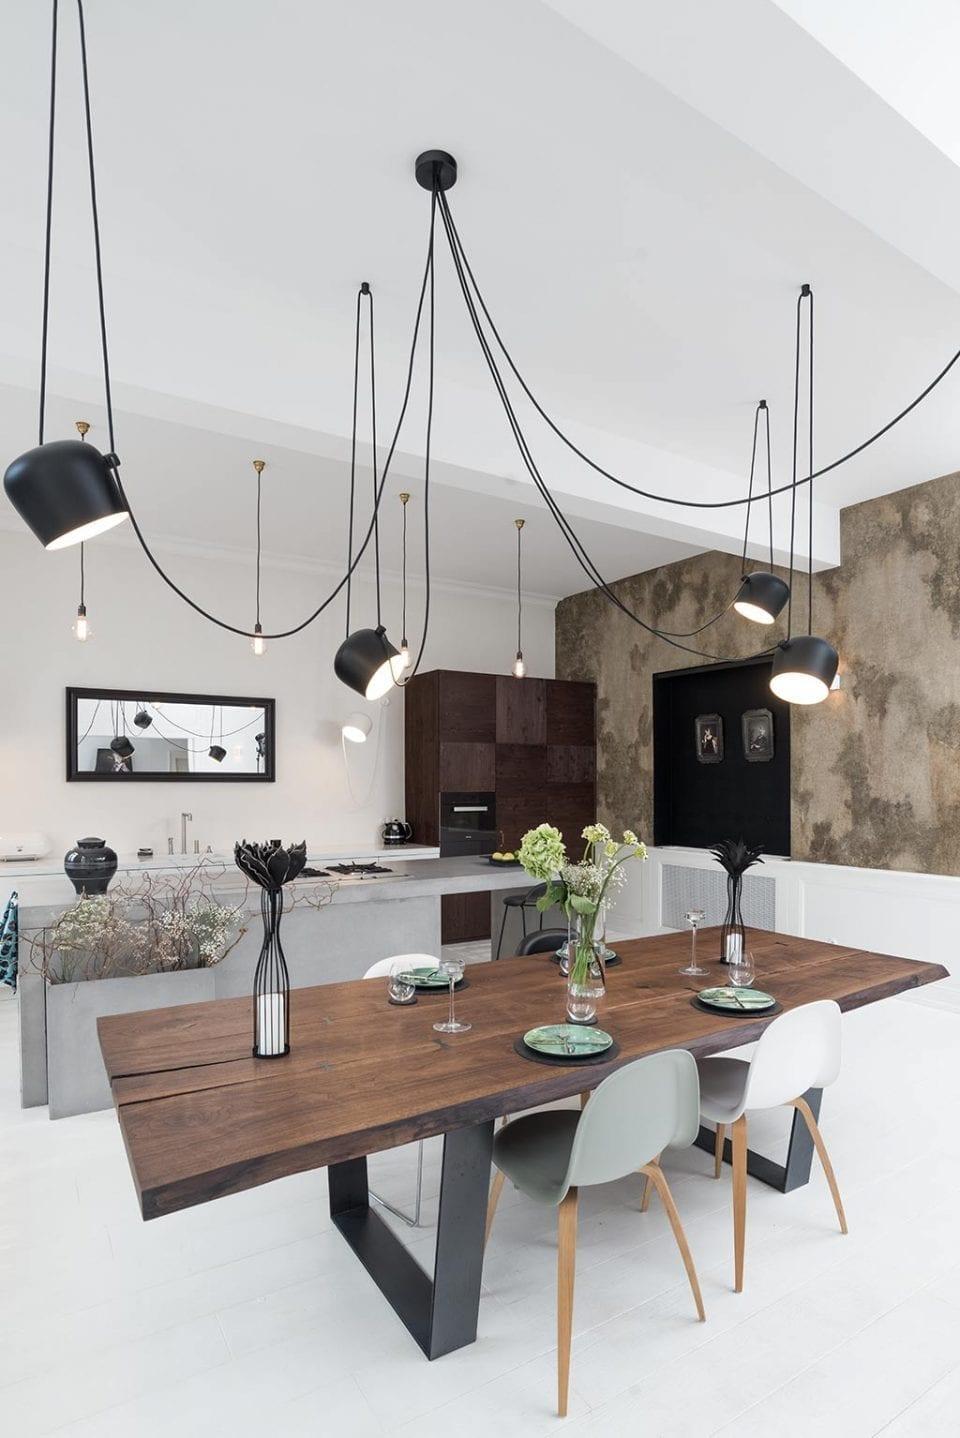 PN7 960x1438 - Look Inside: 1930s Czech Republic Apartment Re-invisioned